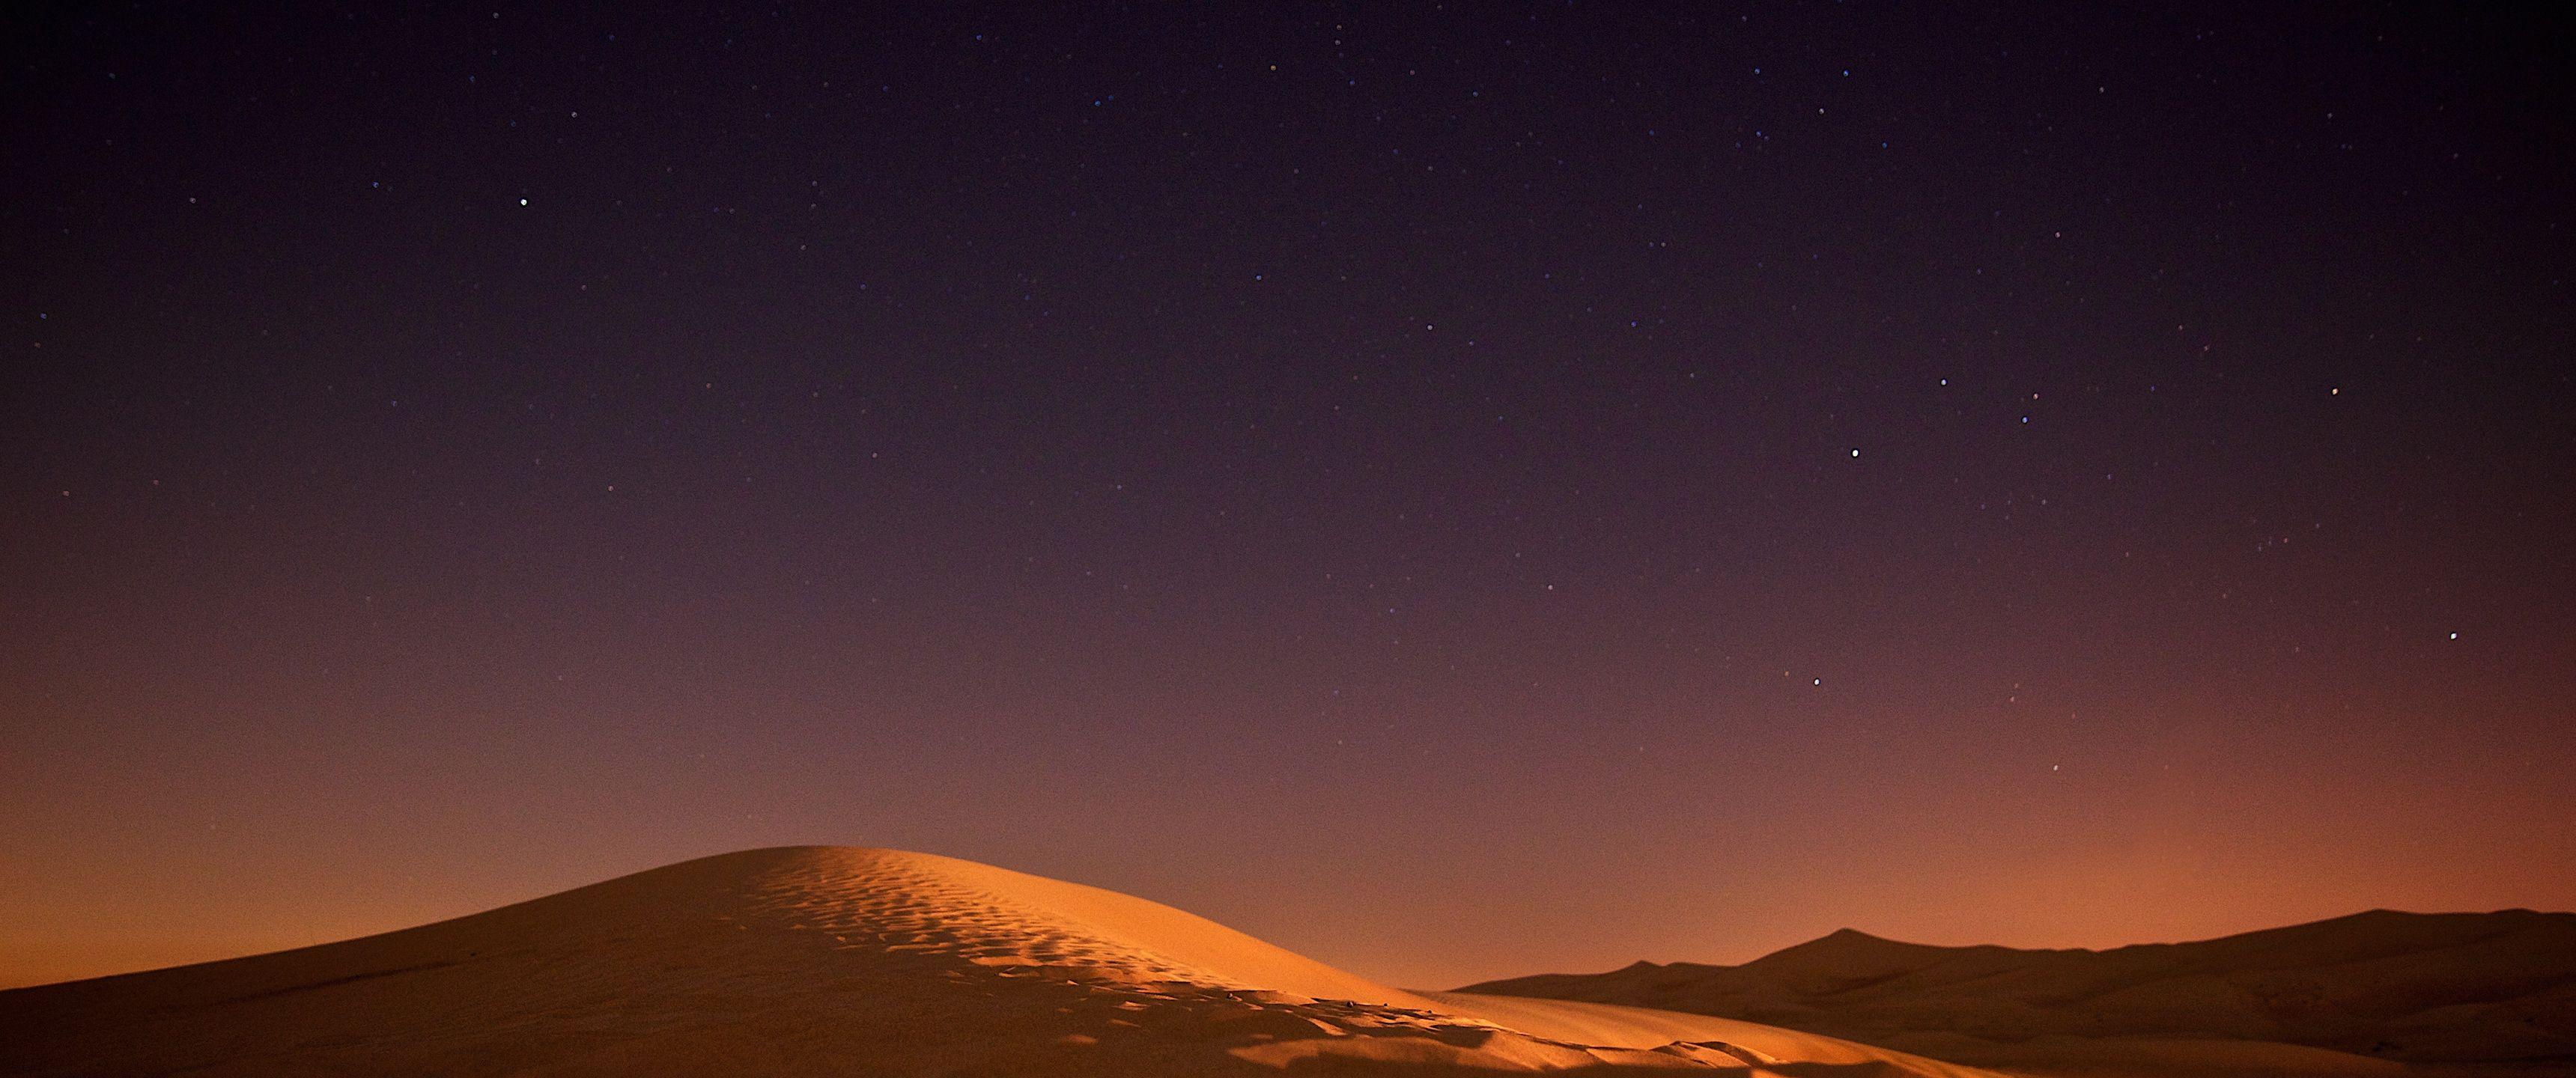 21:9 Ultrawide HD Wallpaper (3440x1440) - Arabian Night ...